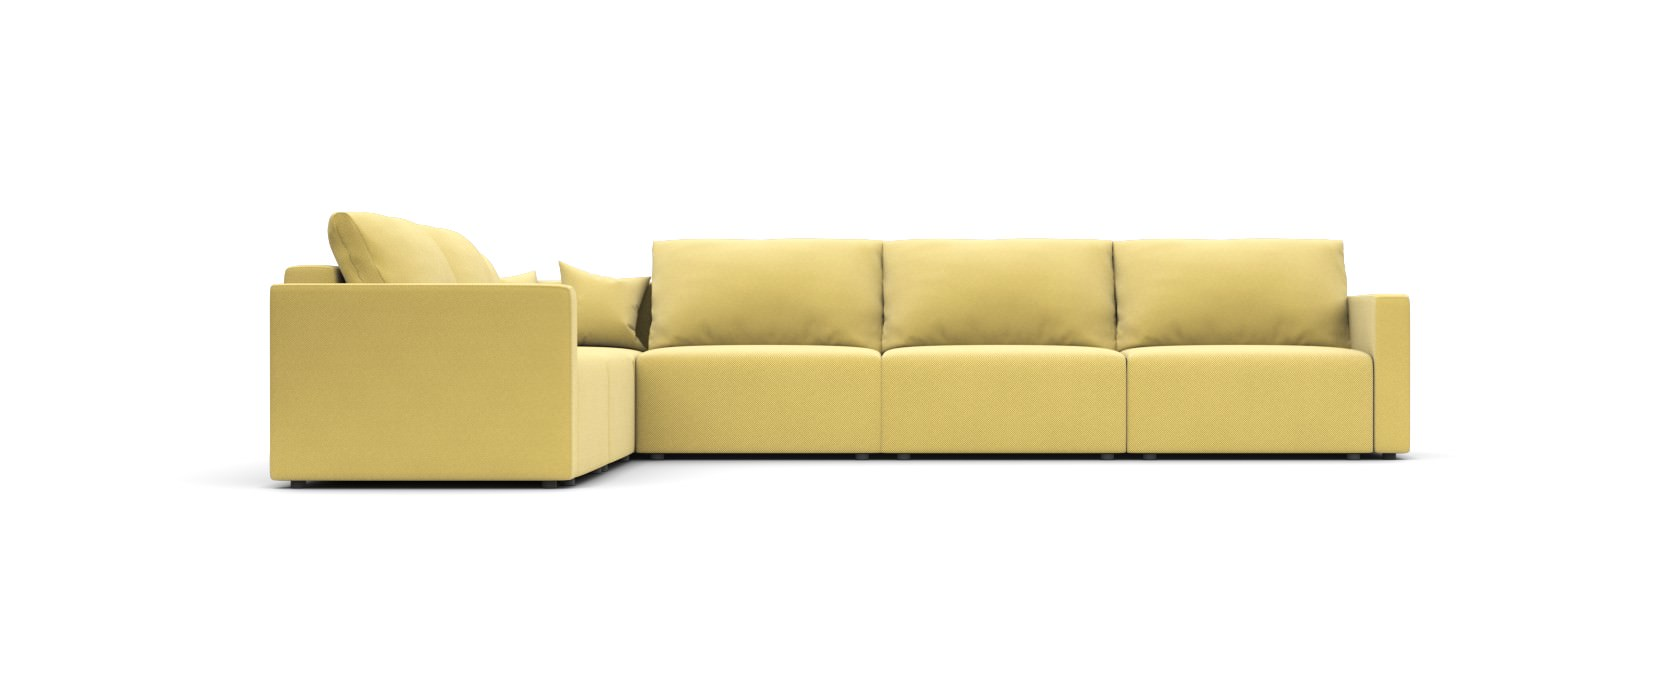 Модульний диван Greta 417x317 - Pufetto